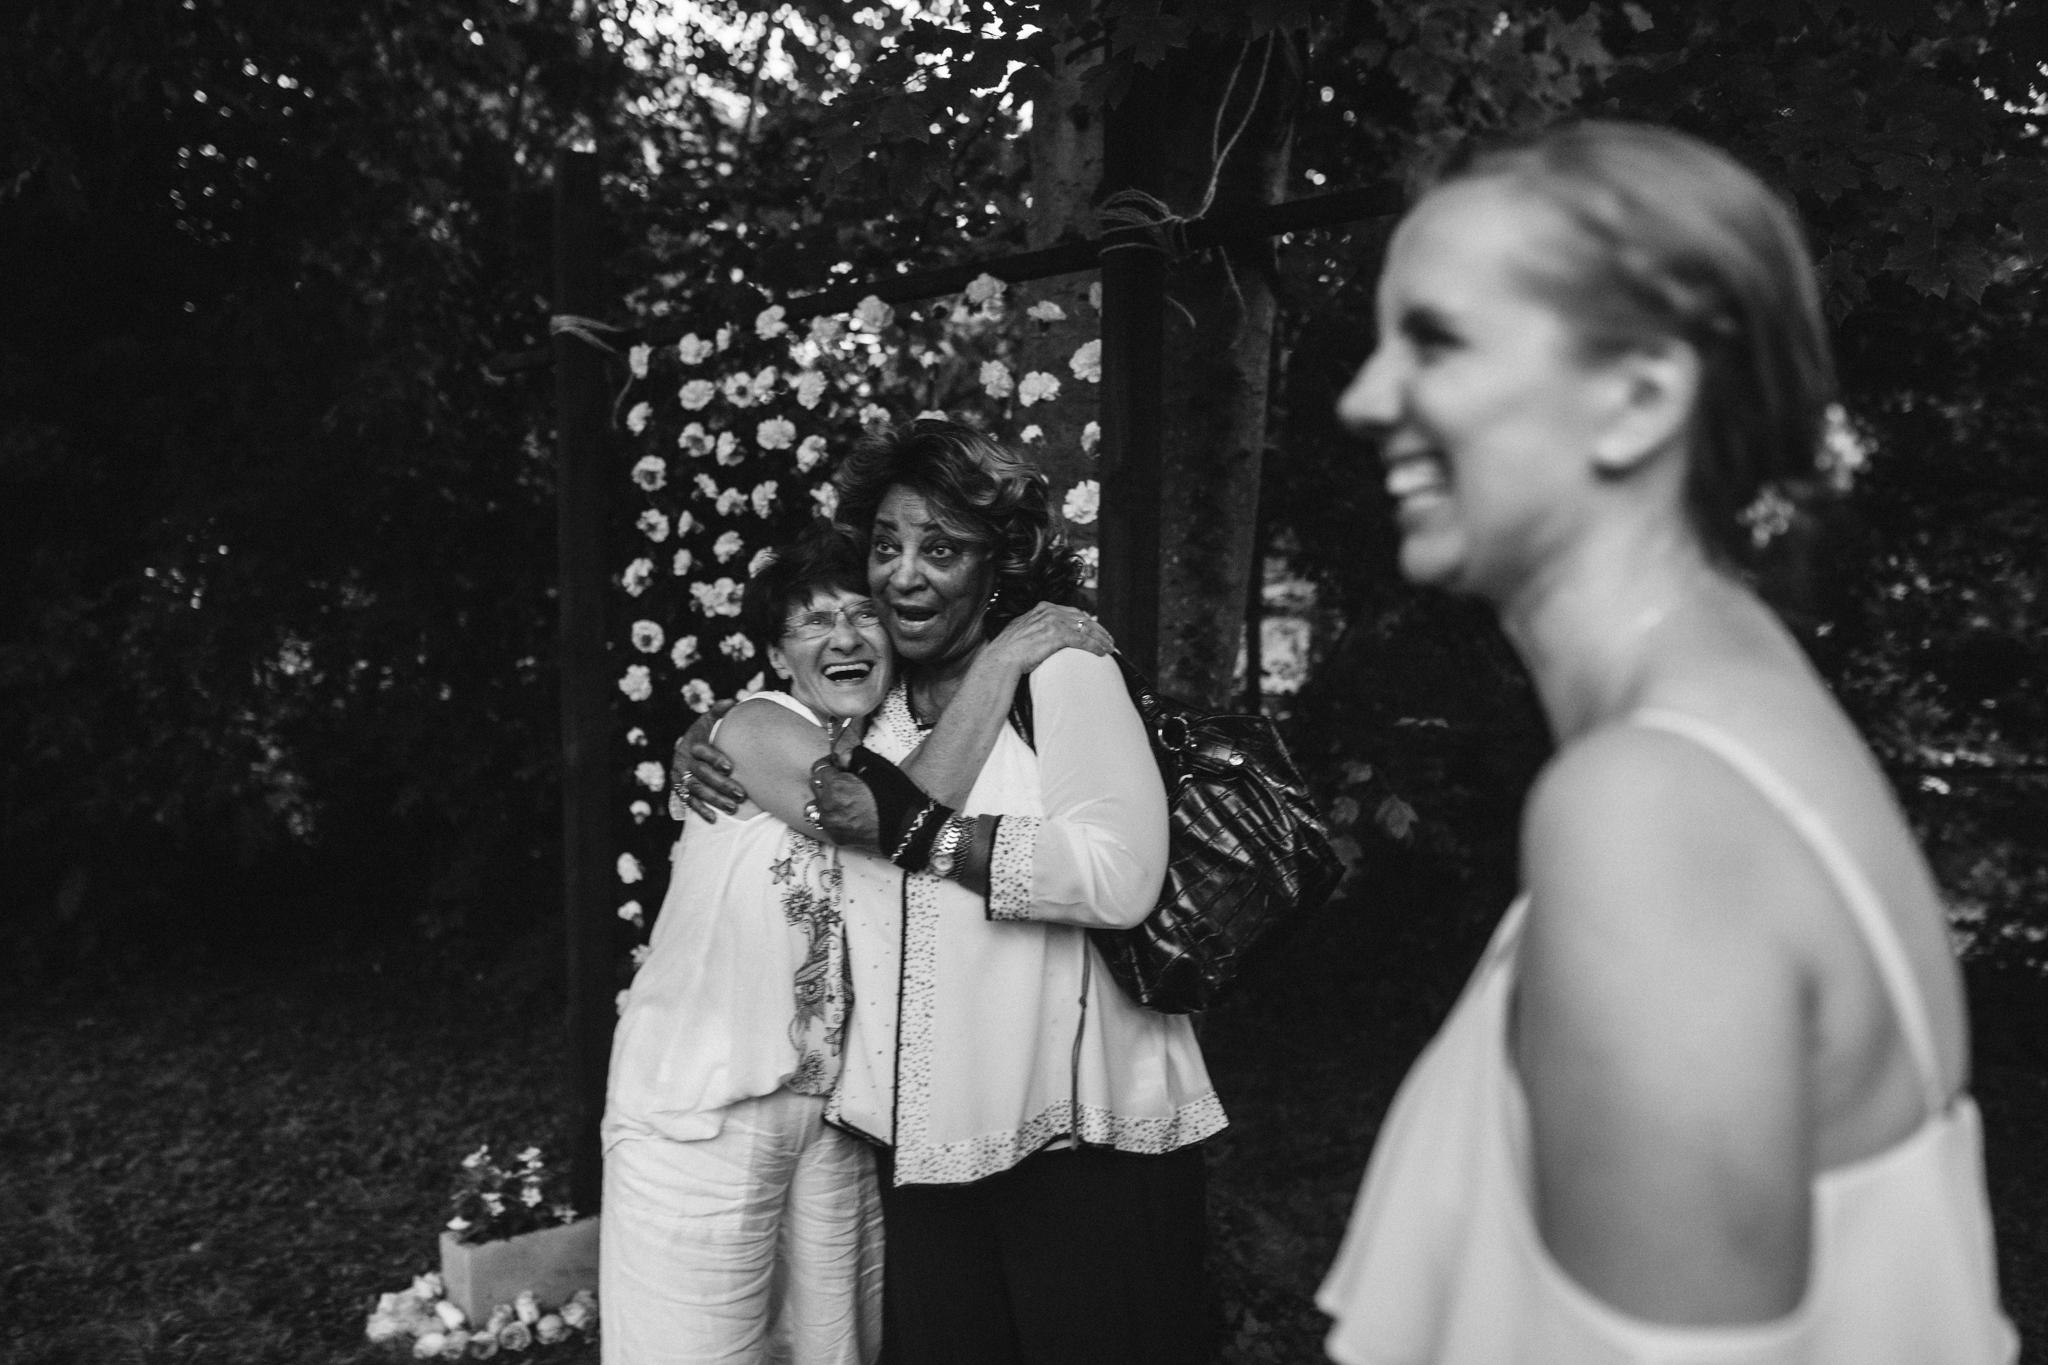 dorota_dwight_richmond_backyard_wedding-109.jpg